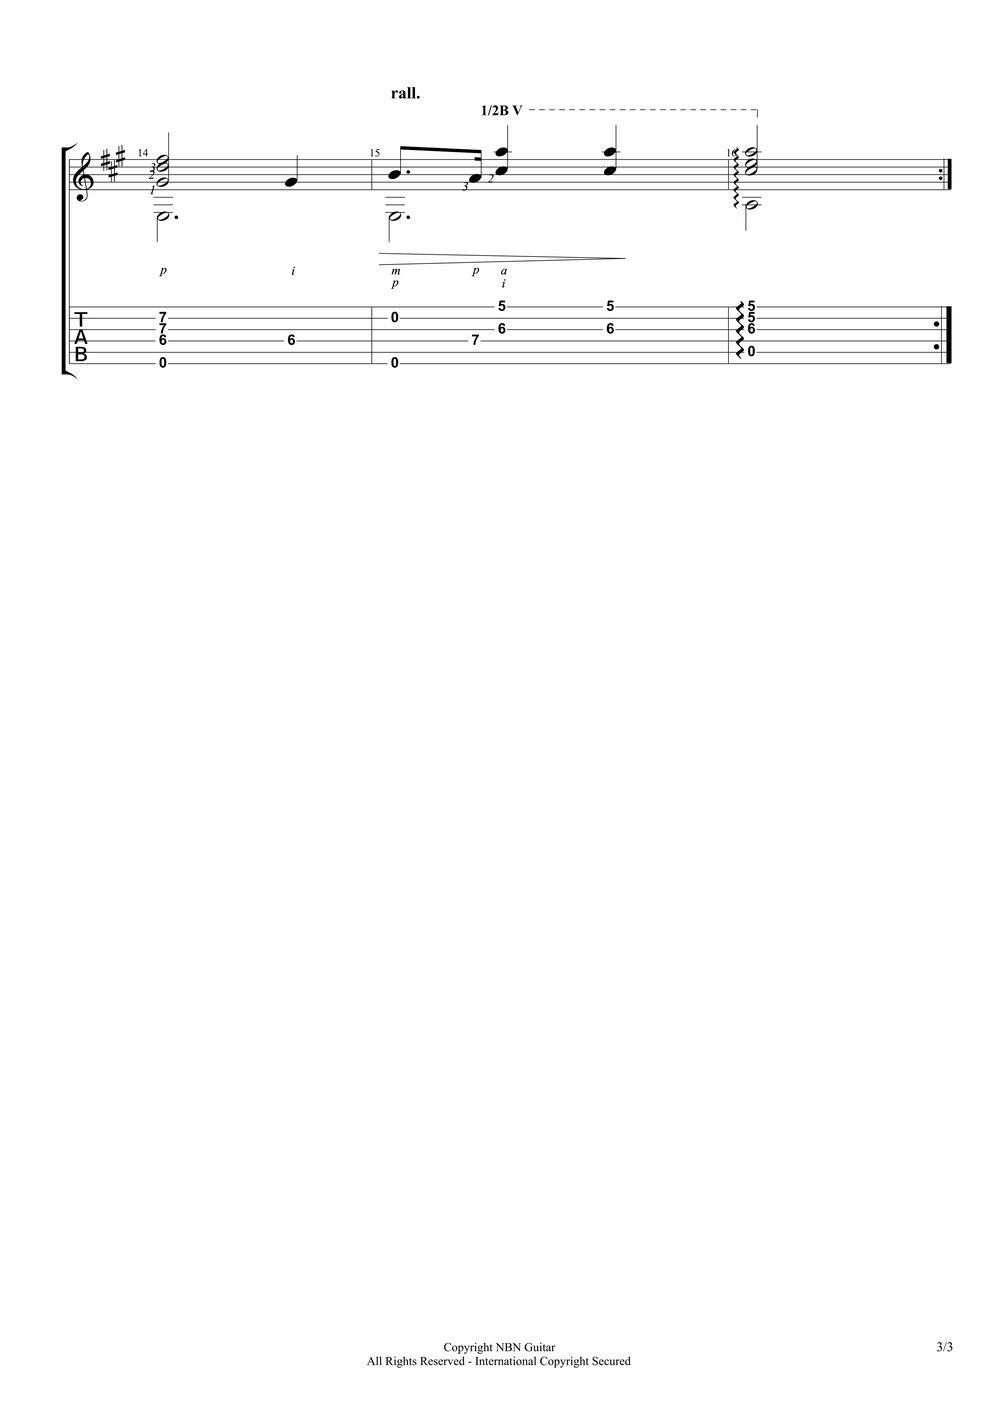 Prelude No. 7, Op. 28 (Sheet Music & Tabs)-p5.jpg